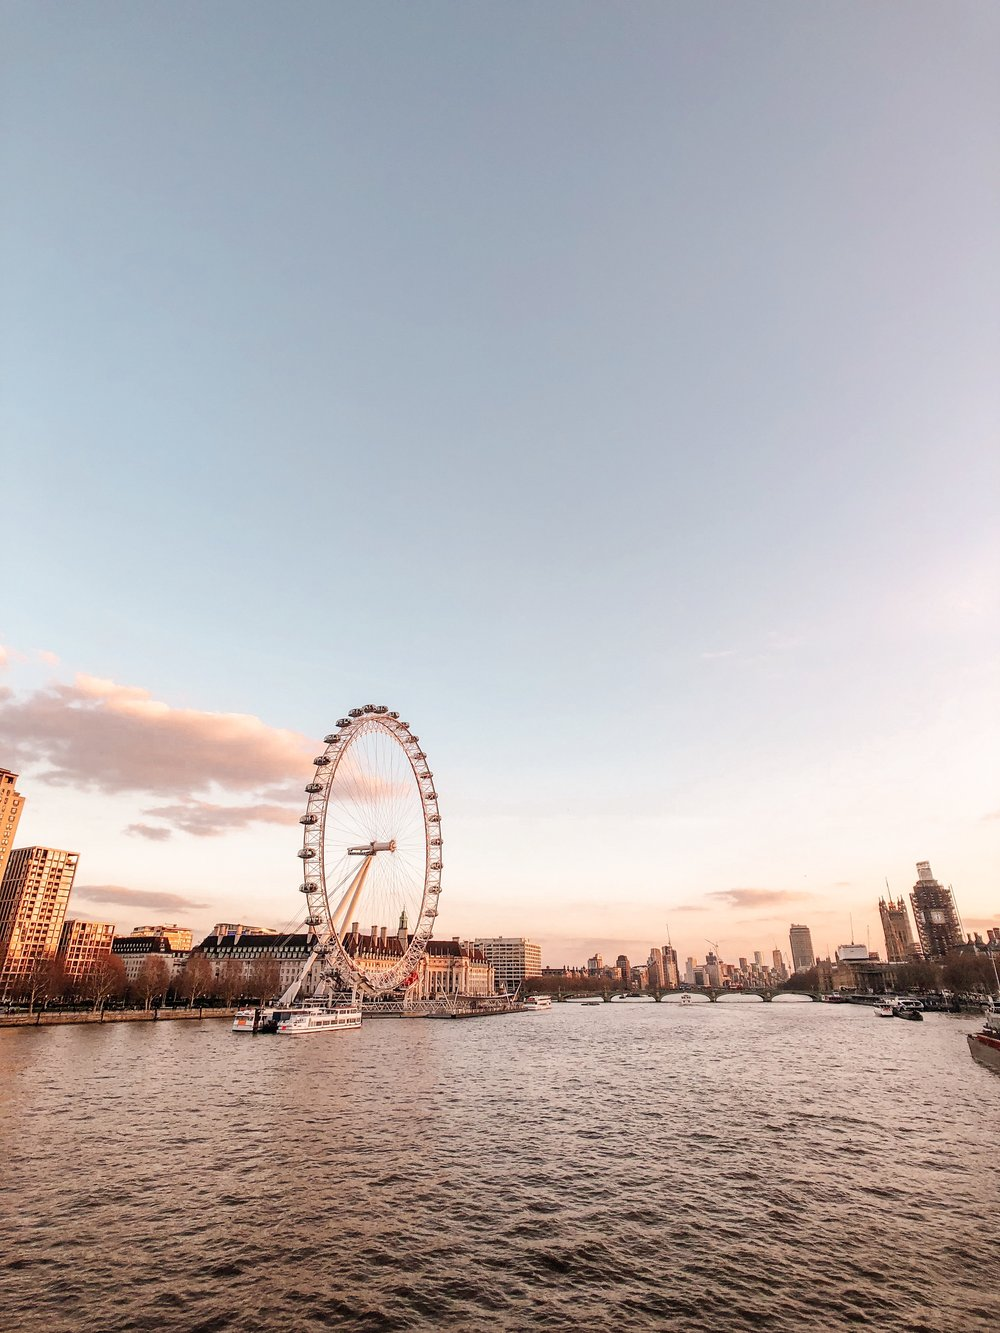 River Thames London Eye at Sunset